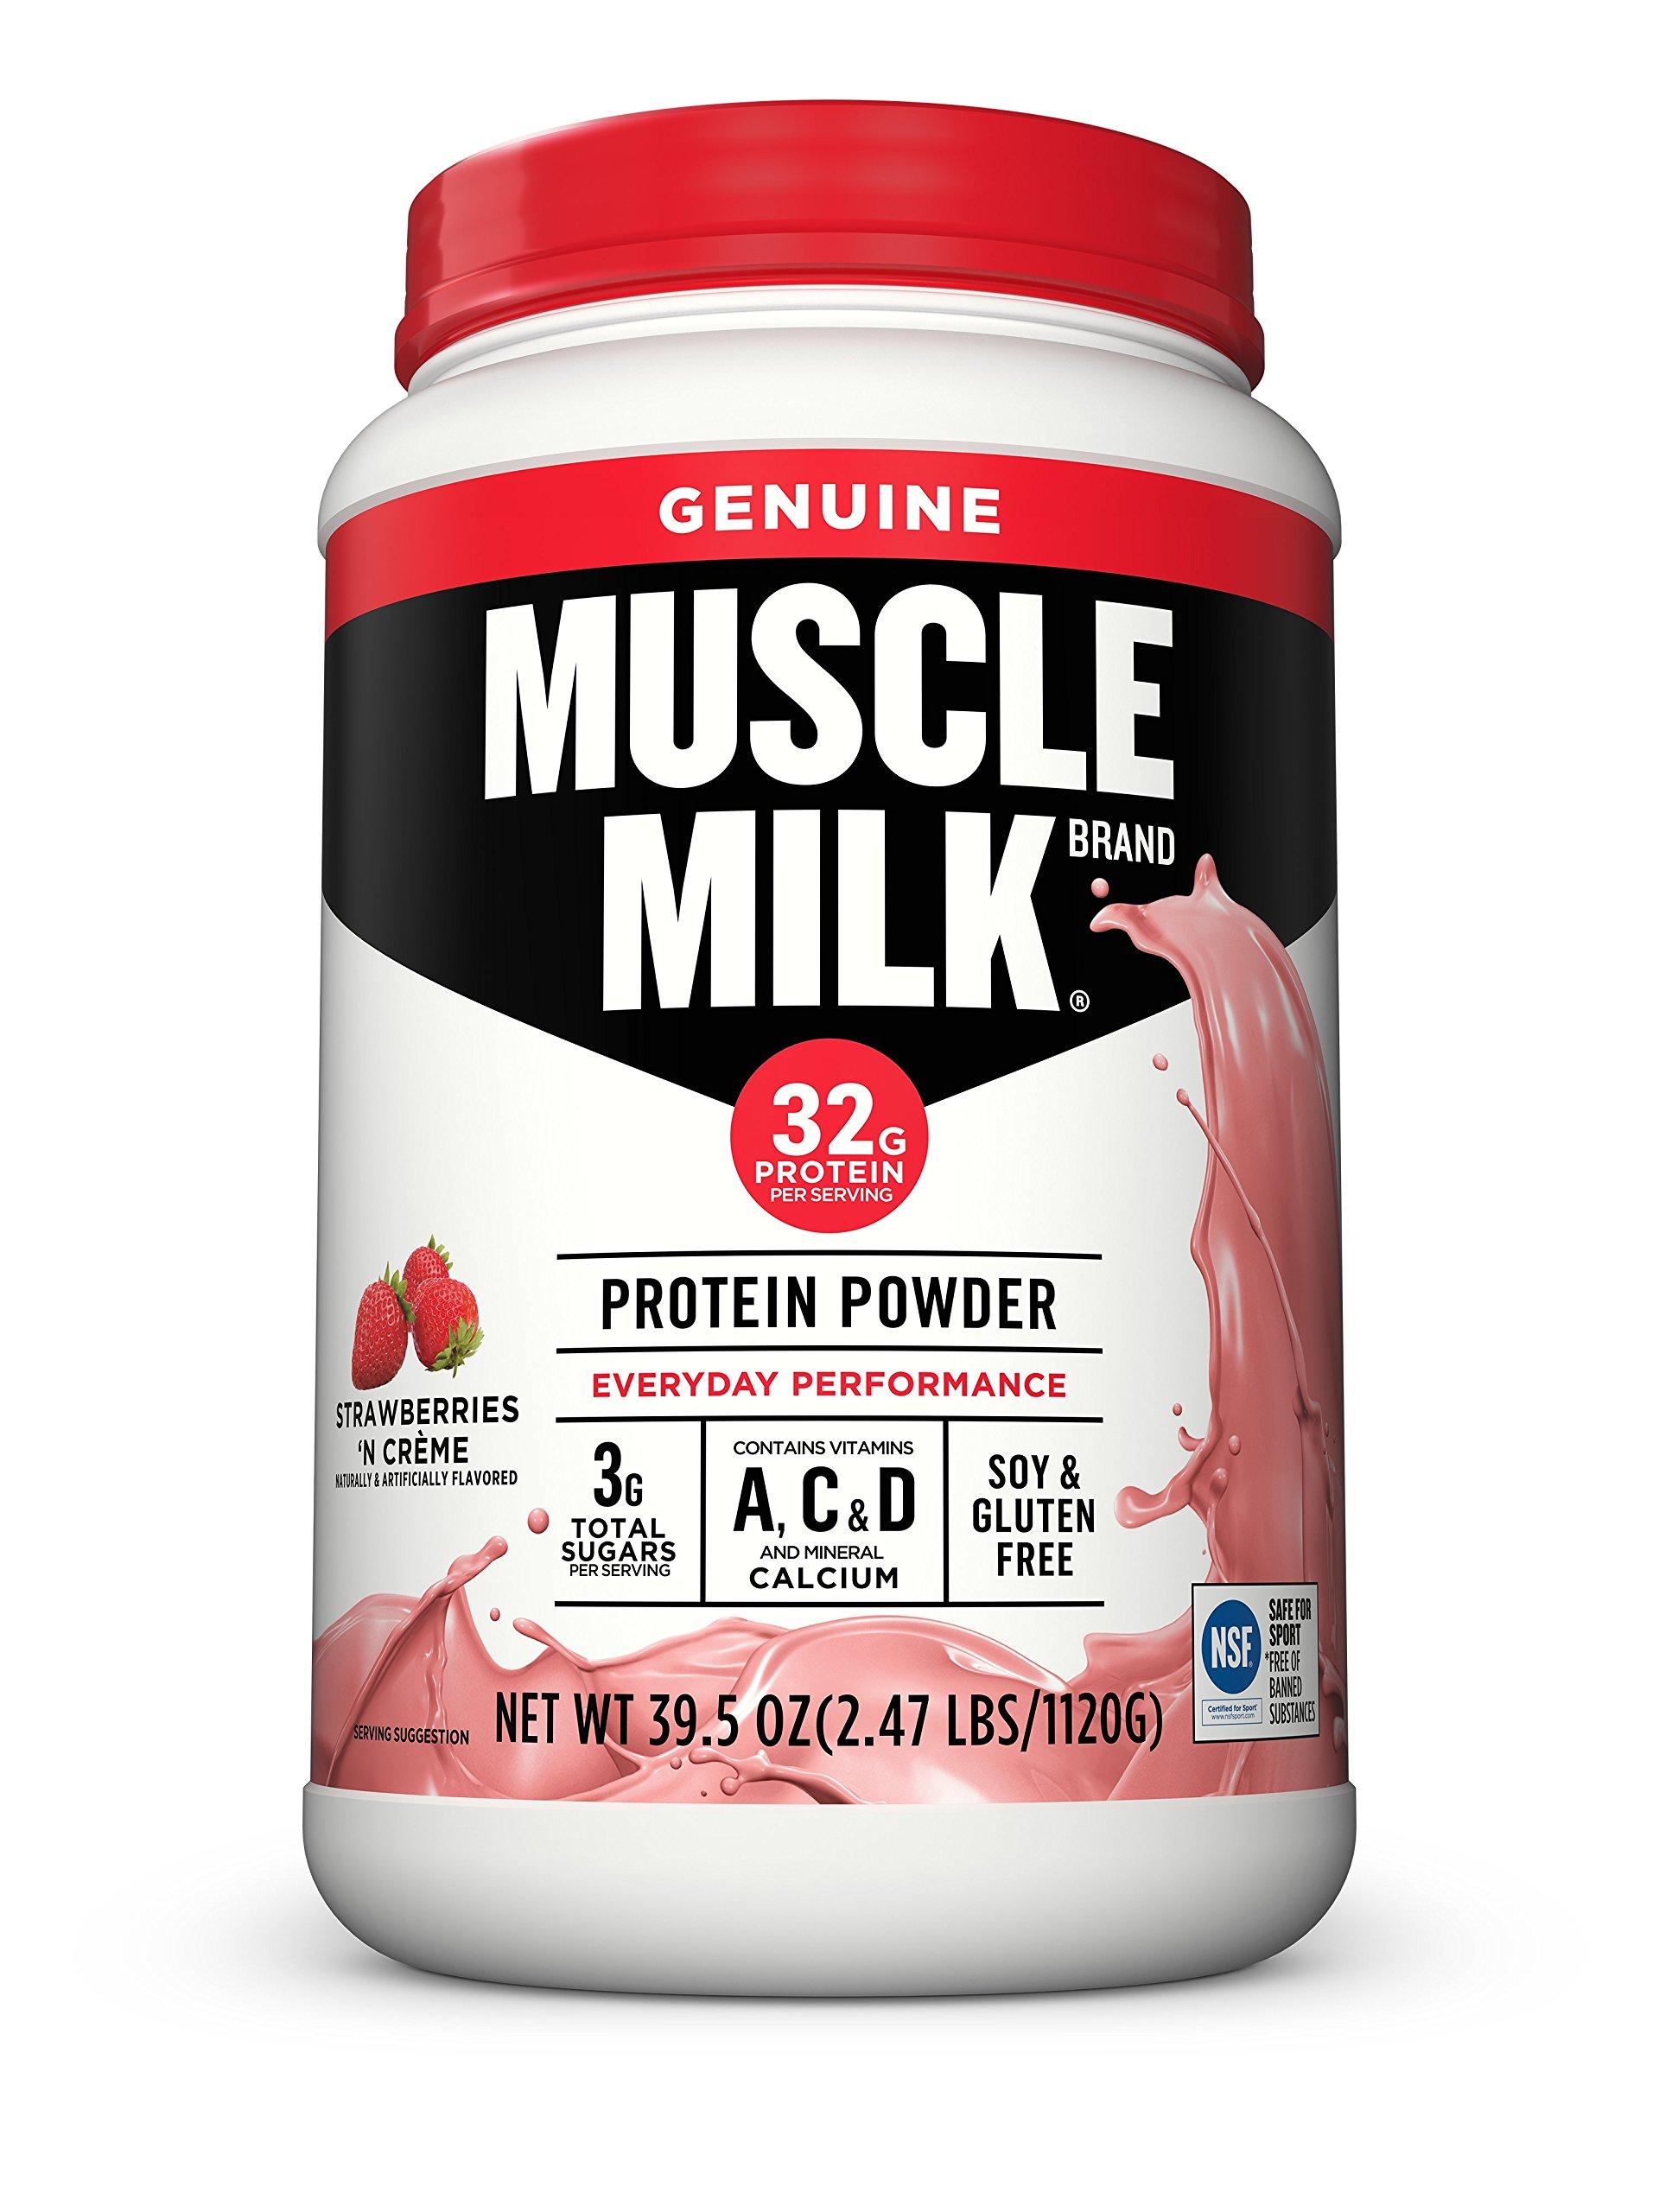 Amazon.com: Muscle Milk Genuine Protein Powder, Cake Batter, 32g ...